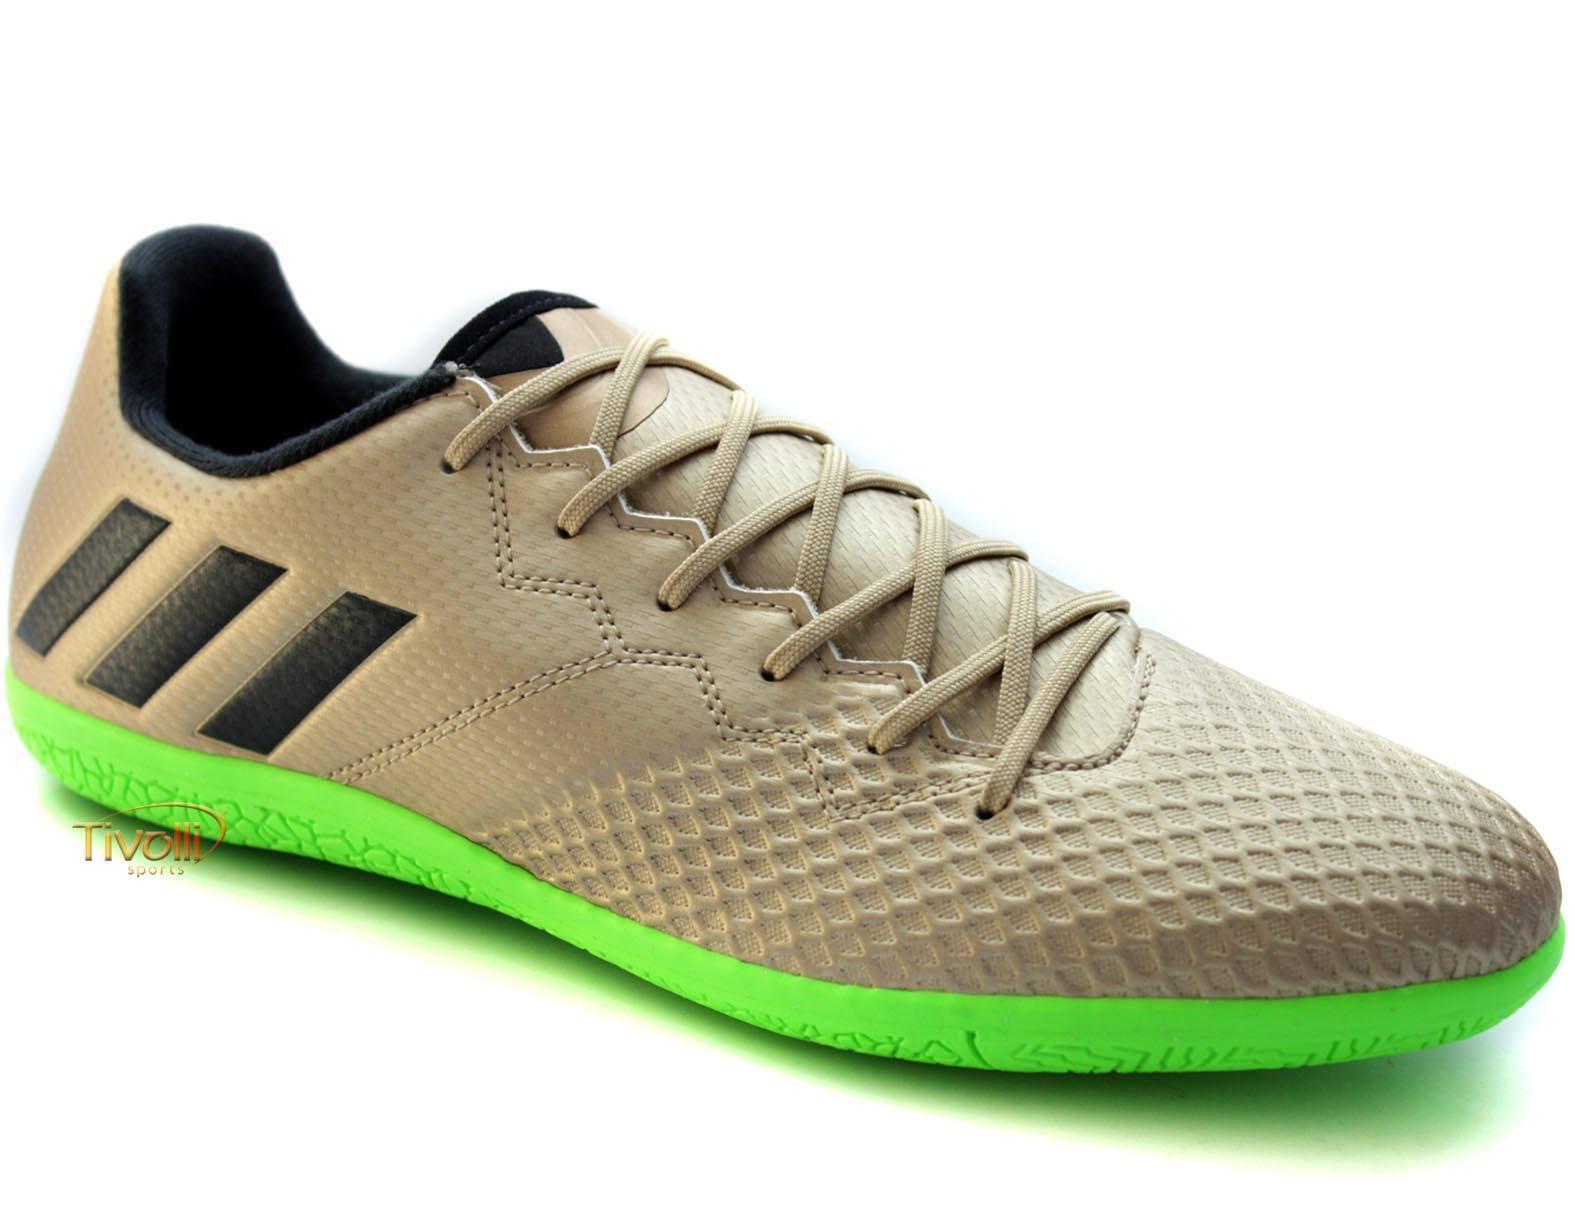 bf08fcb2c3c51 Chuteira Adidas Messi 16.3 IC Futsal